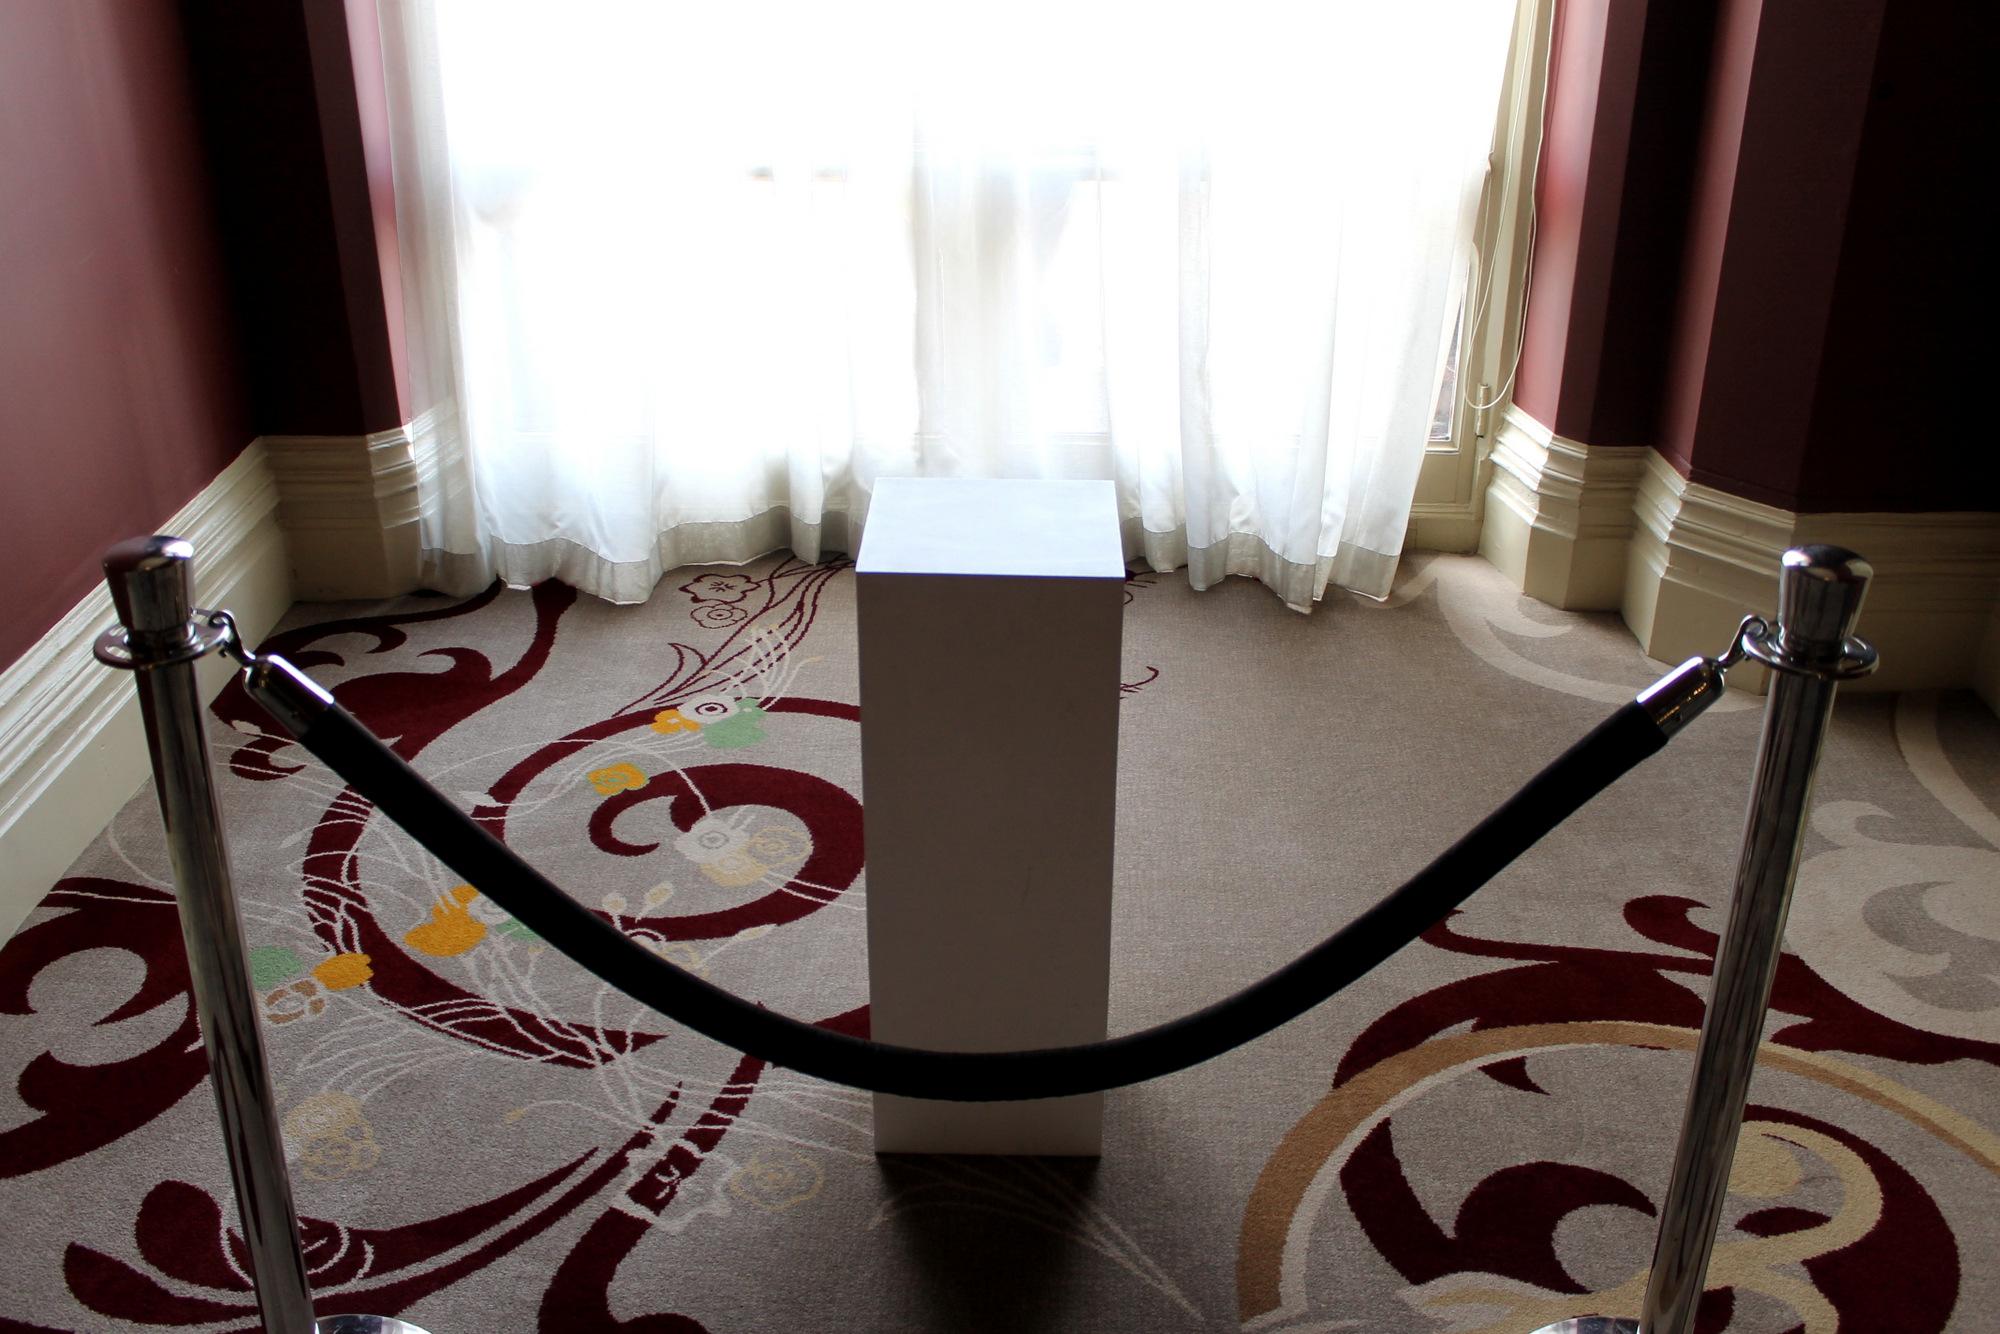 Executive Chef:Adam Ashe - Cuisine: Modern EuropeanTwitter: @stpancrasren Instagram: @stpancrasrenAddress: Euston Rd, Kings Cross, London NW1 2AR Phone: 020 7841 3540 Website: marriott.co.uk/hotels/travel/lonpr-st-pancras-renaissance-hotel-london